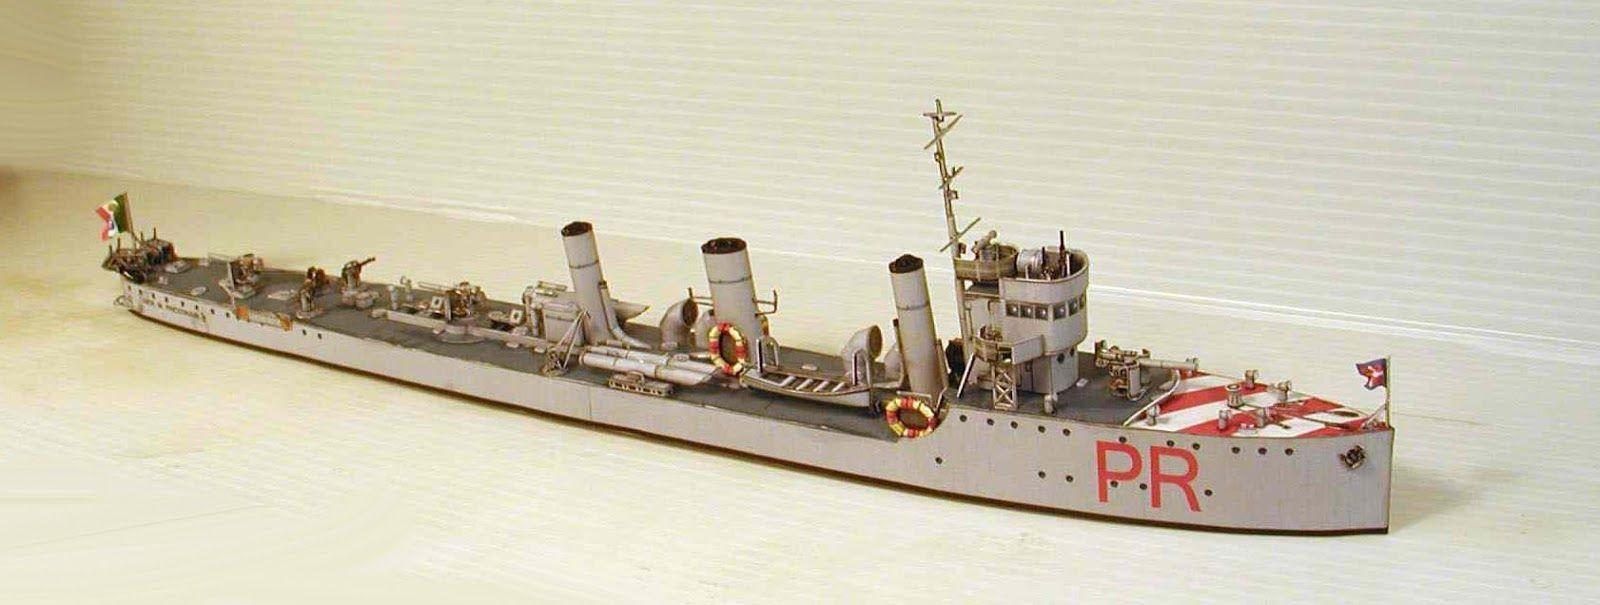 Papercraft Battleship Battleship Vittorio Emanuele Papercraft Italian